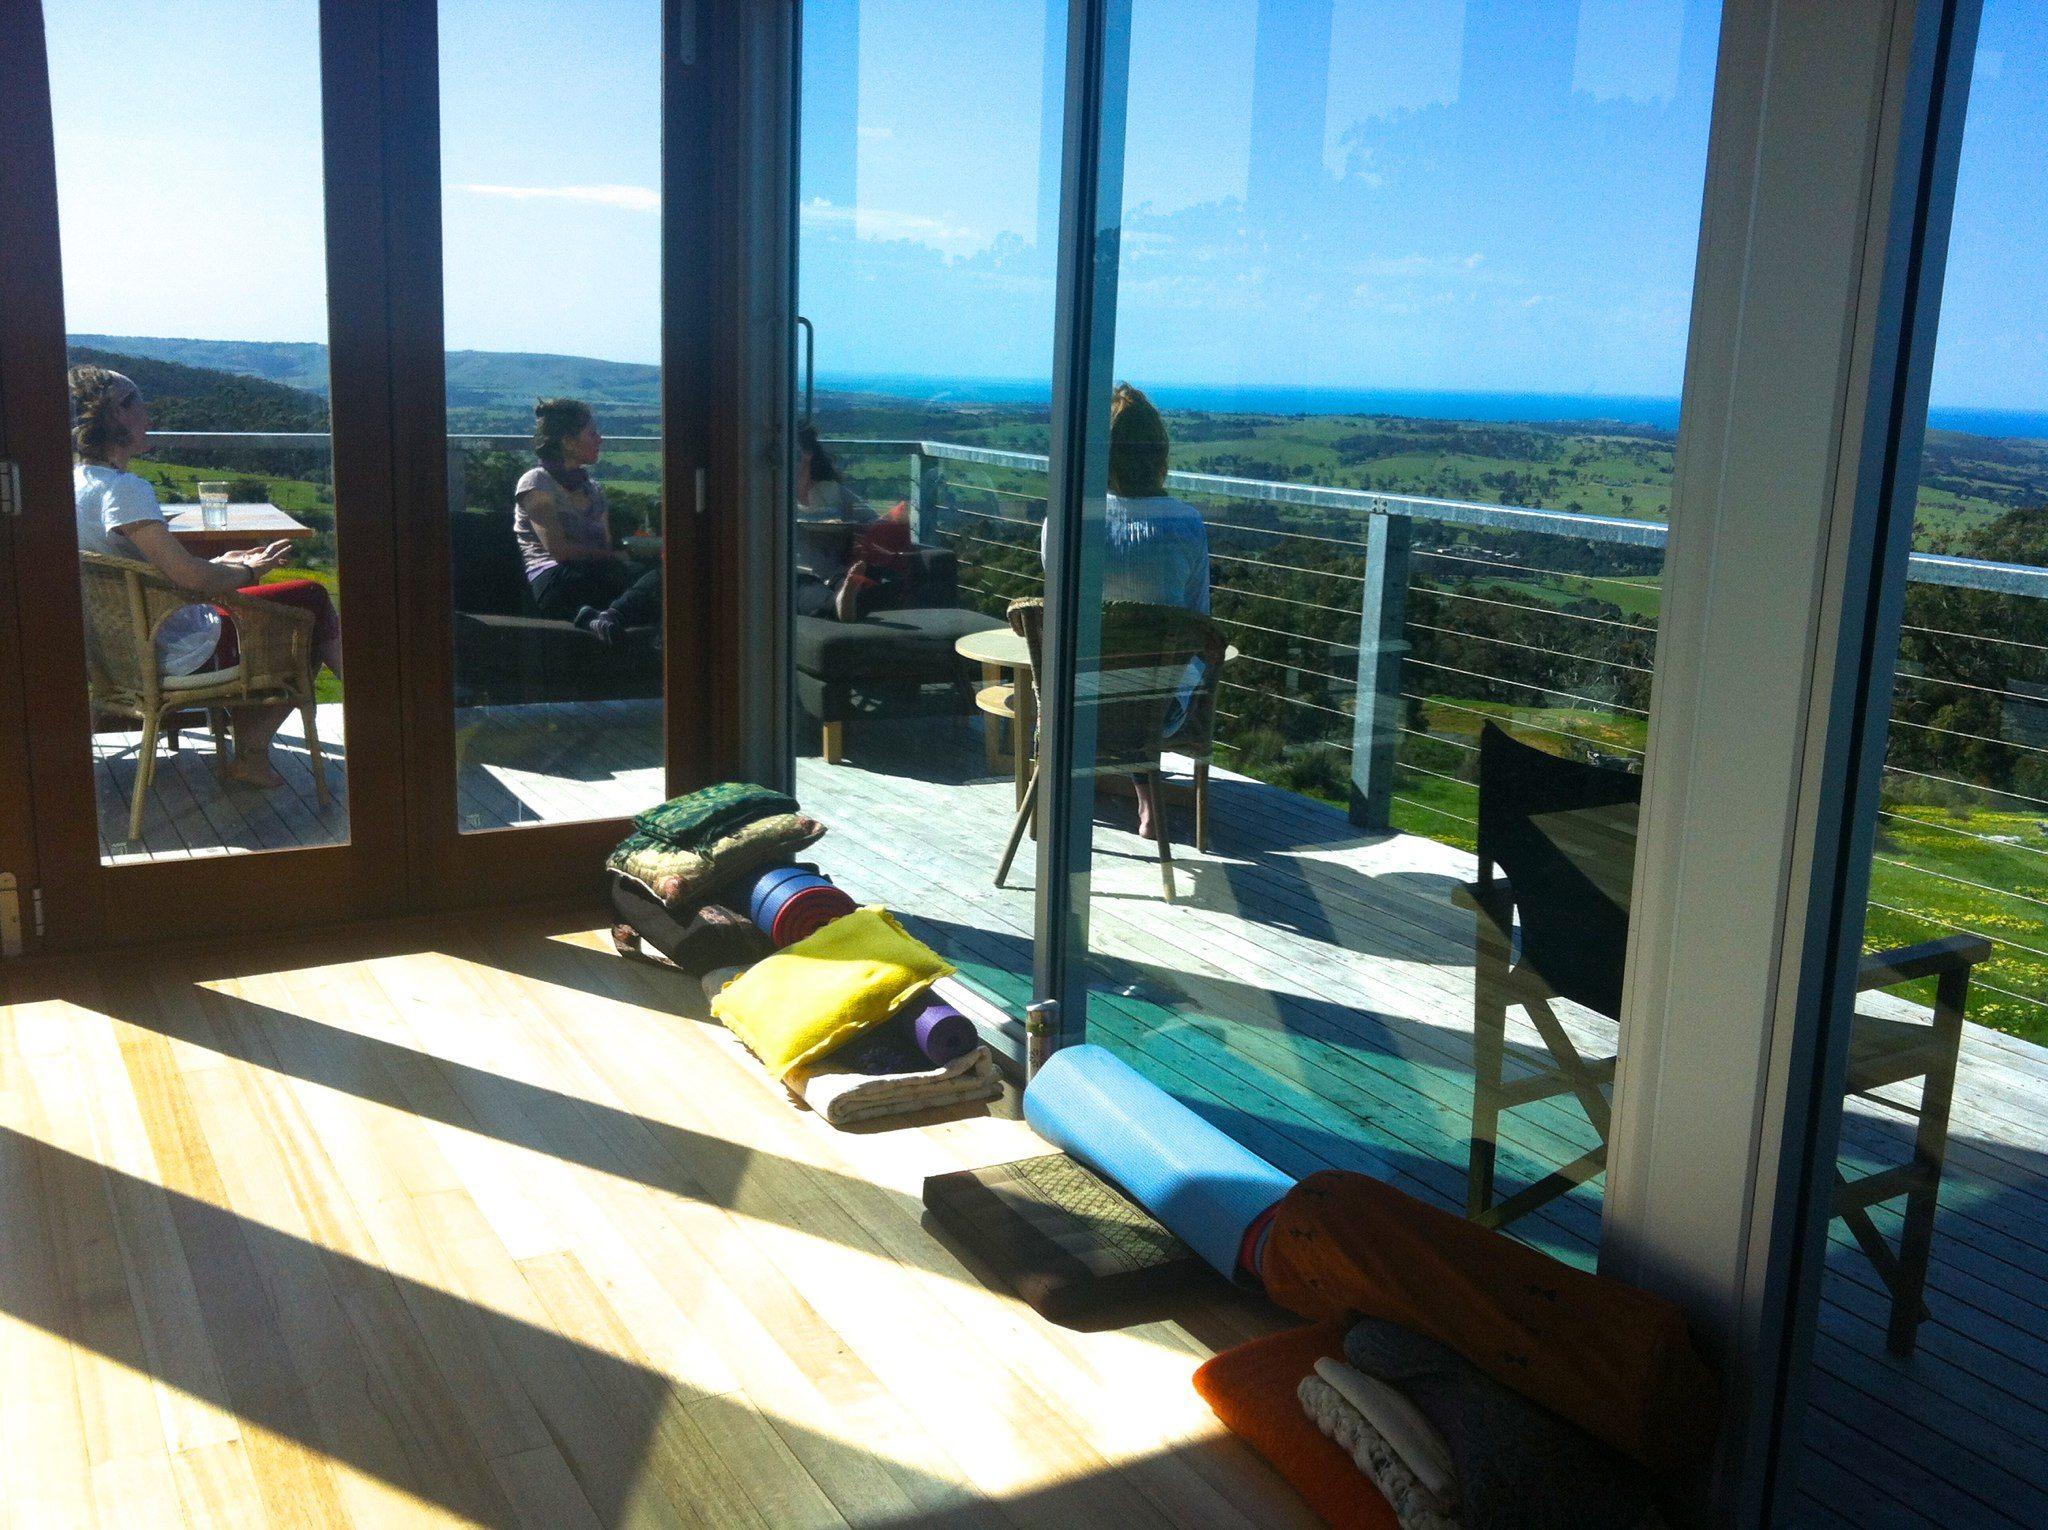 At the Eco Lodge Retreat